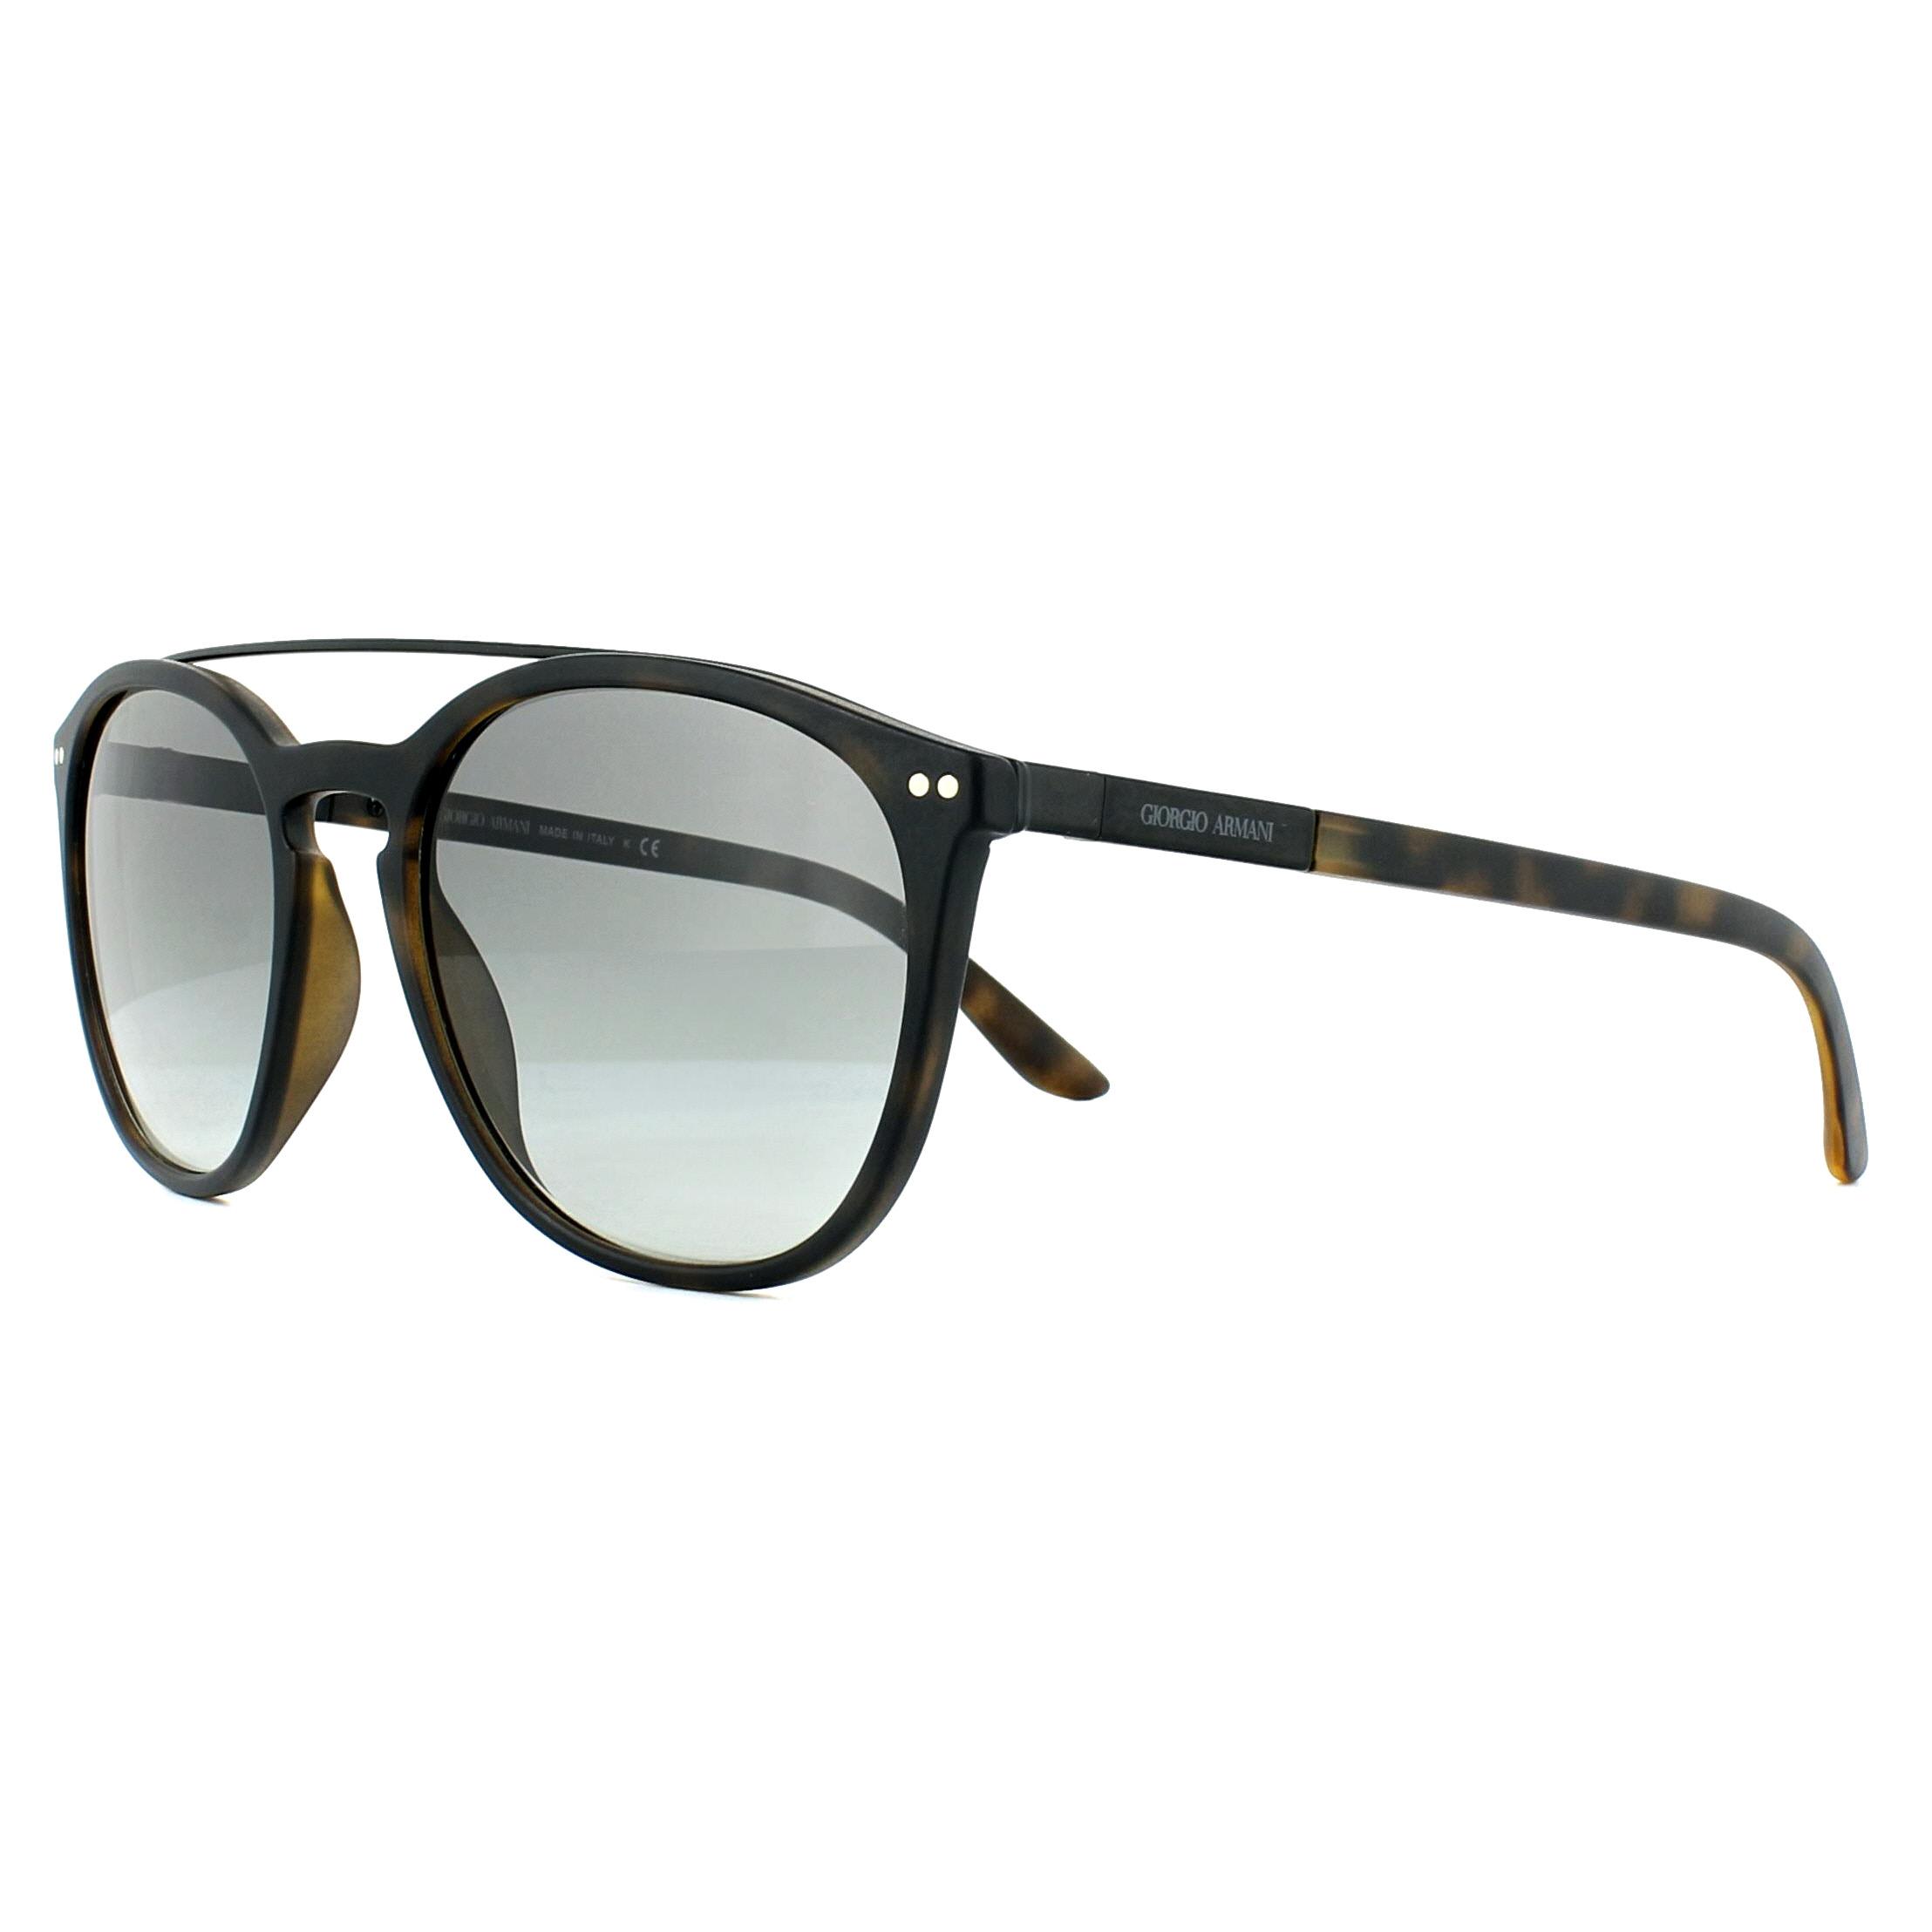 af8e54165573 Sentinel Giorgio Armani Sunglasses AR8088 508911 Matte Havana Grey Gradient